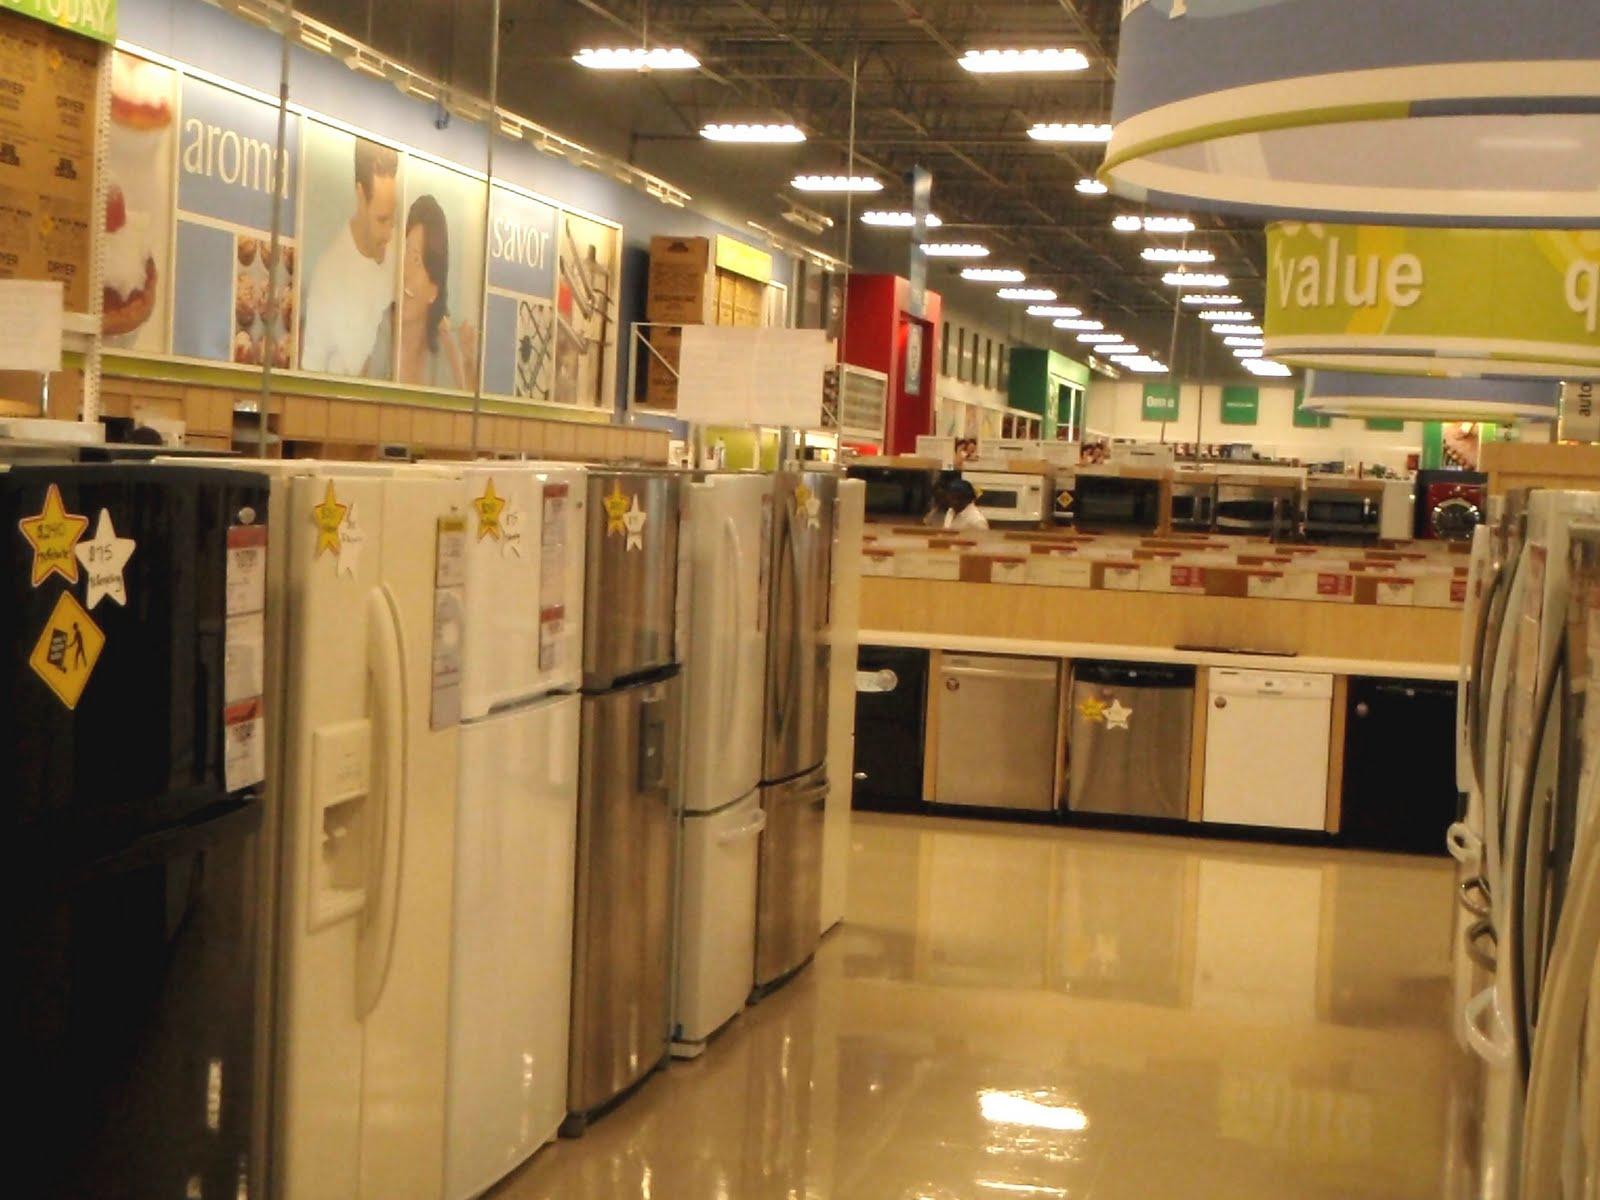 Global power of high tech appliances home appliances world for High tech kitchen appliances